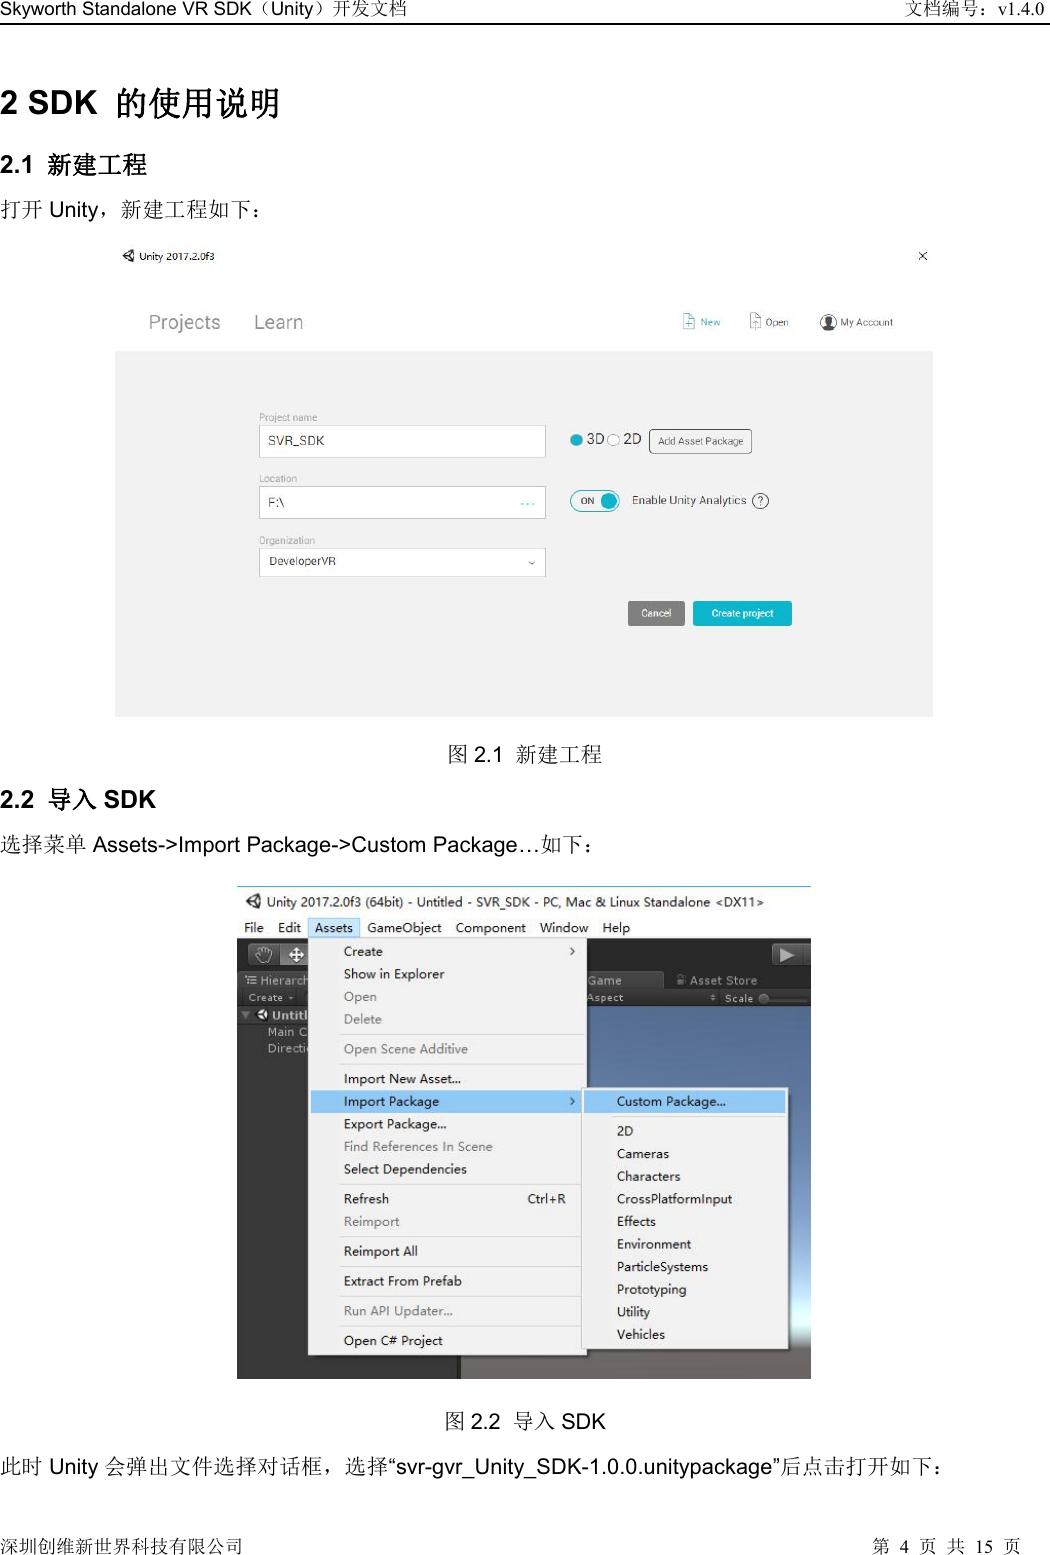 Skyworth Standalone VR SDK Unity Developers Guide CN